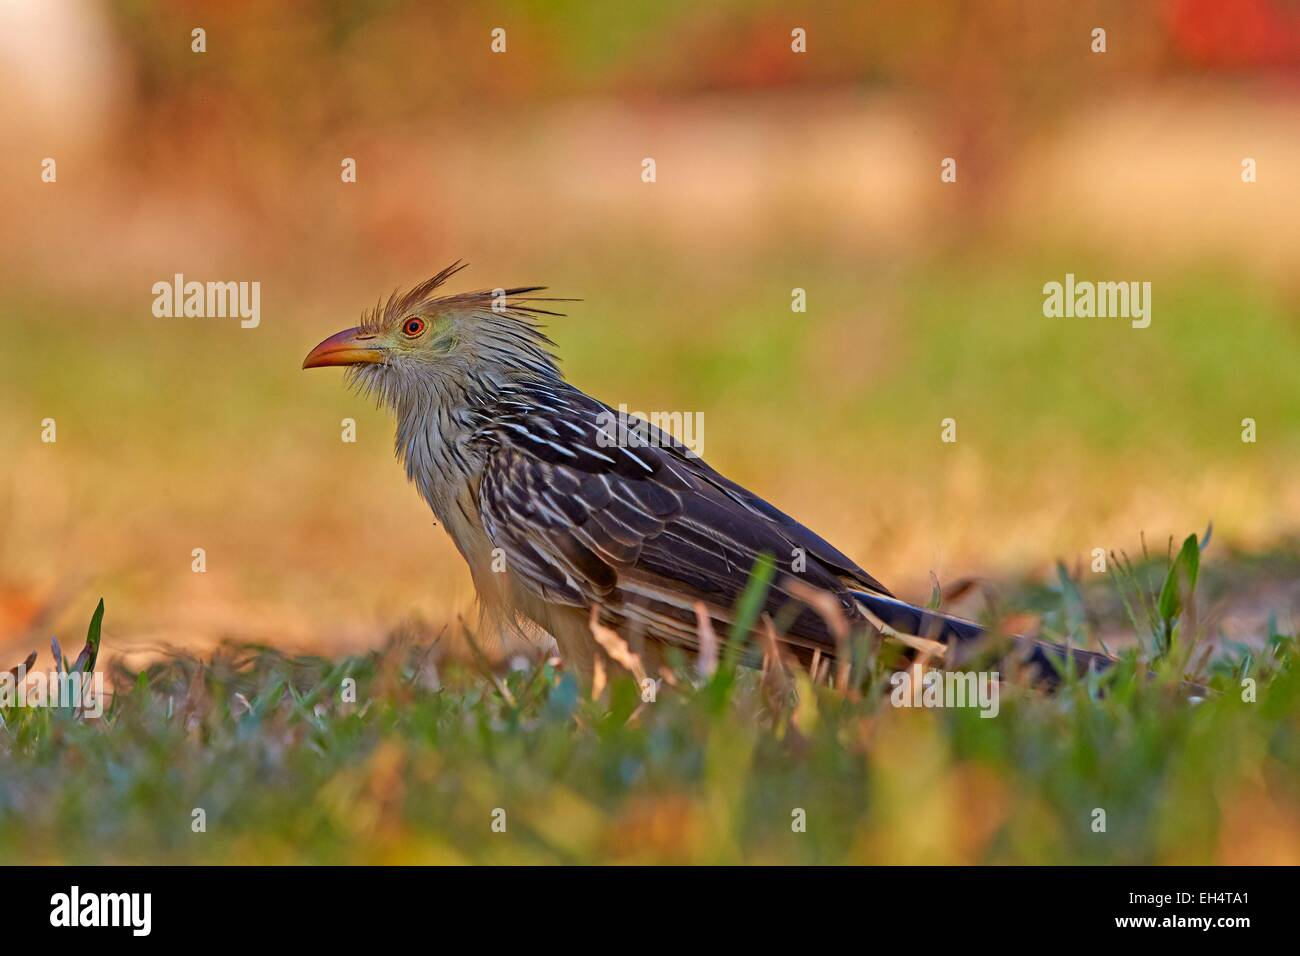 Brazil, Mato Grosso, Pantanal region, guira cuckoo (Guira guira), adult on the ground - Stock Image